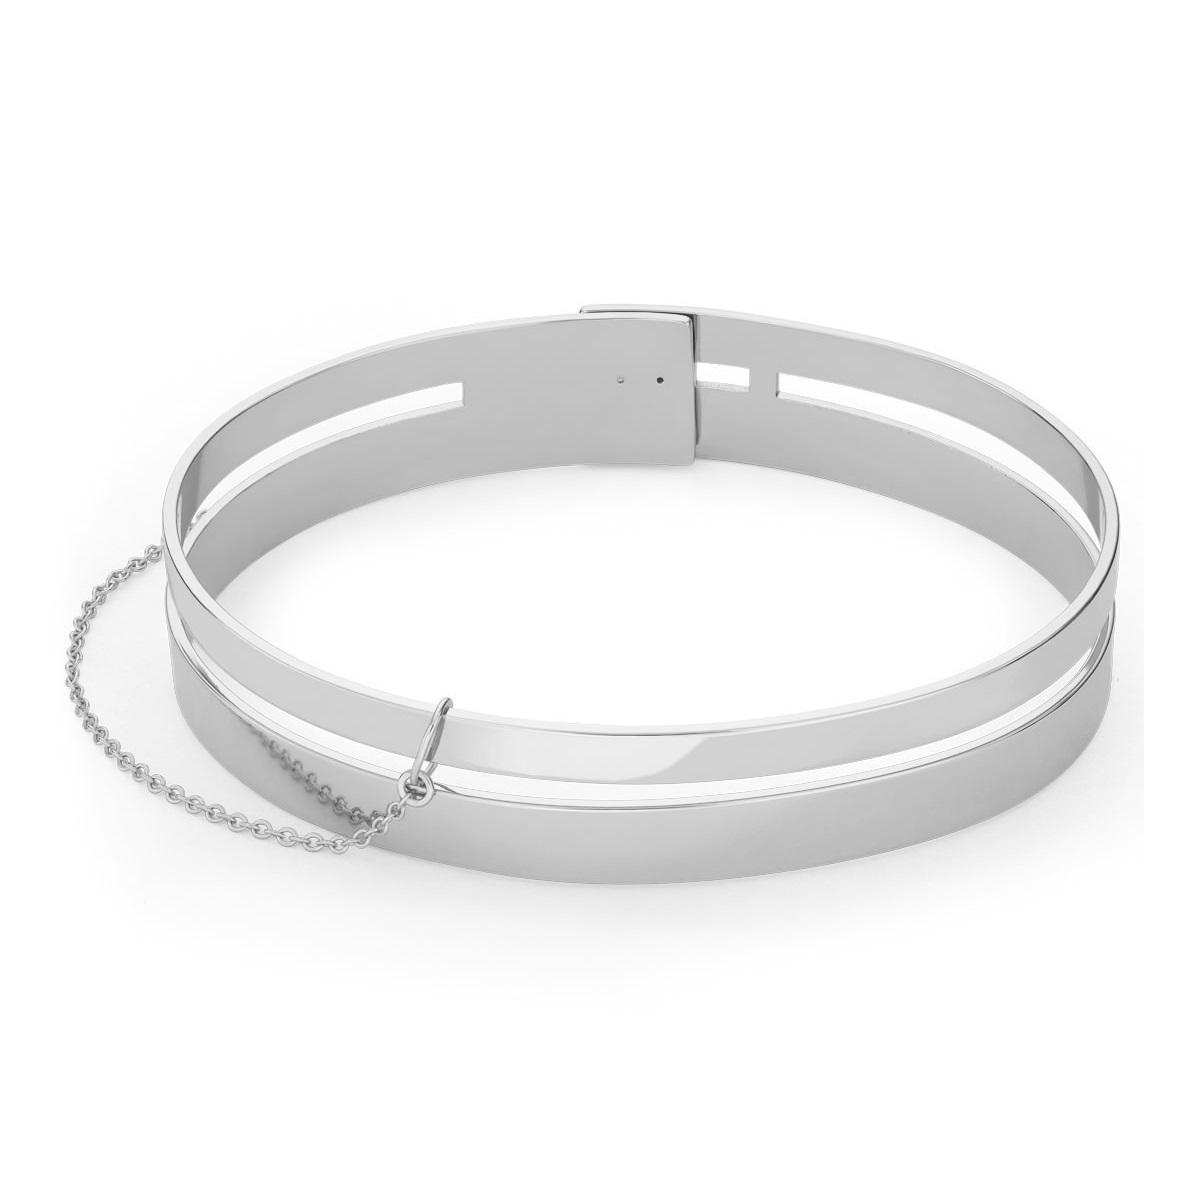 Rosefield Armband Double Bar Bangle Silver